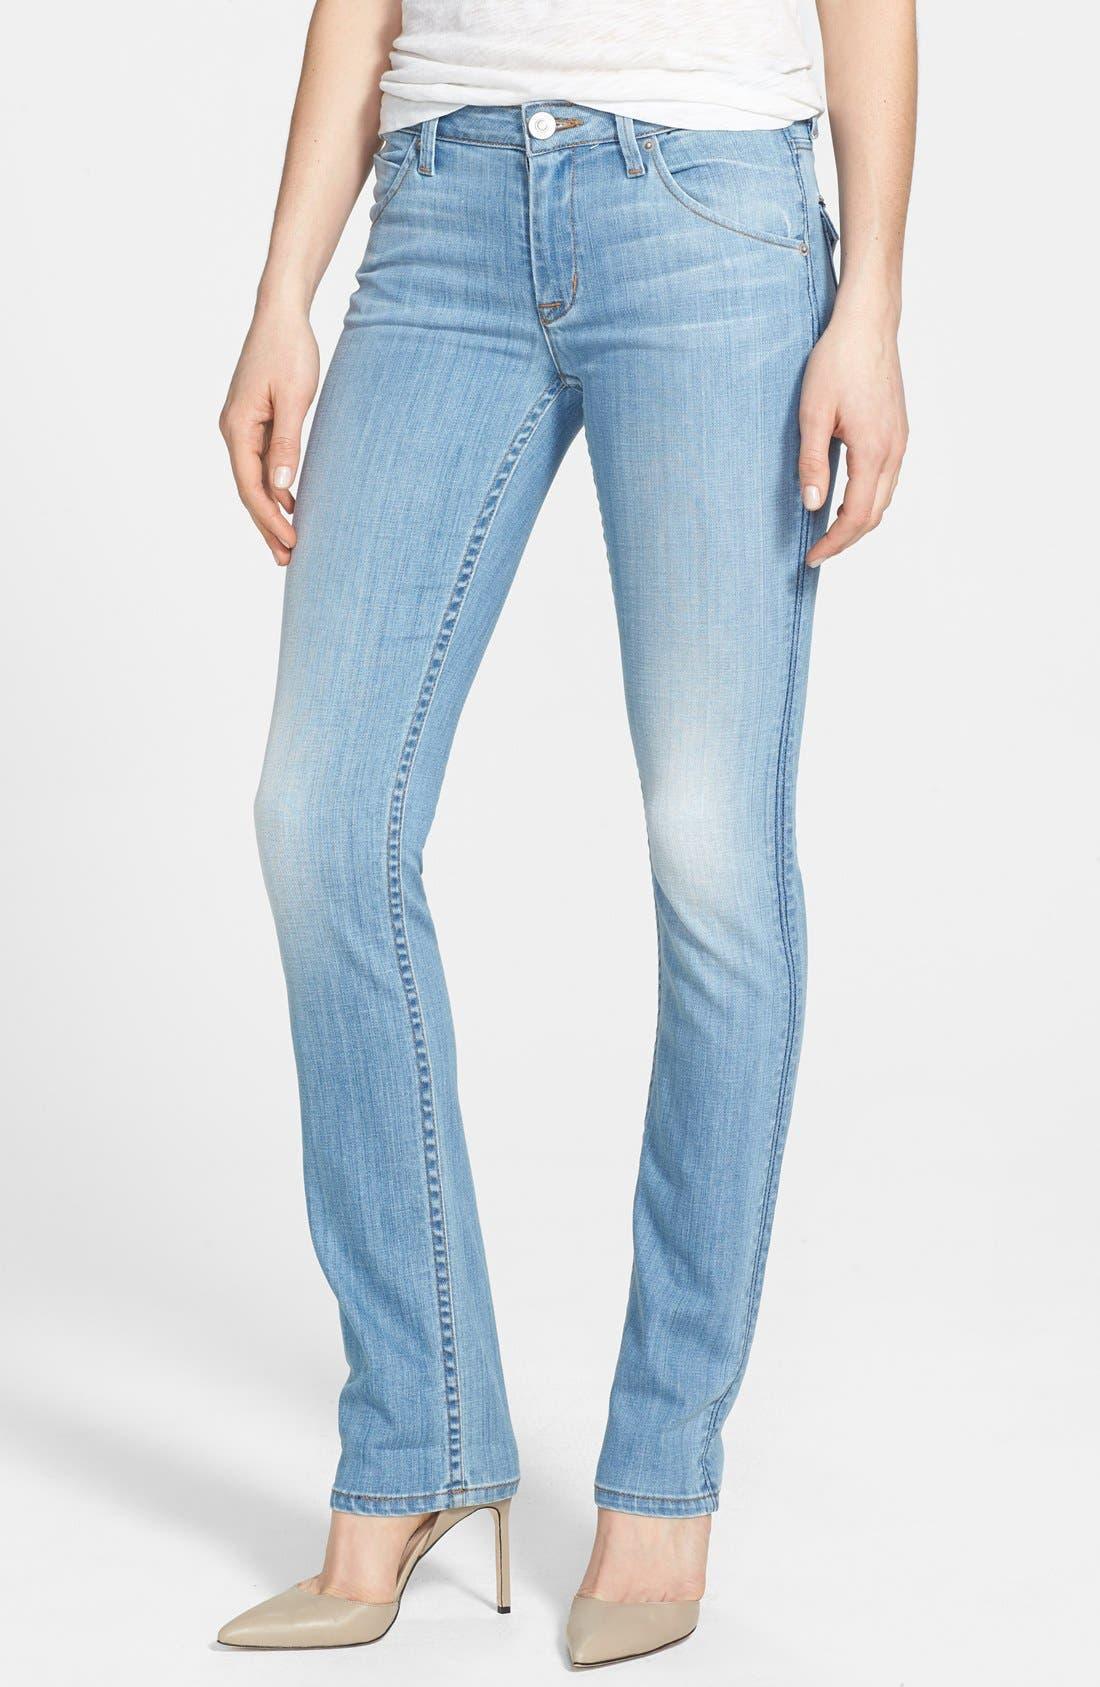 Alternate Image 1 Selected - Hudson Jeans 'Carly' Straight Leg Jeans (I Got Soul)